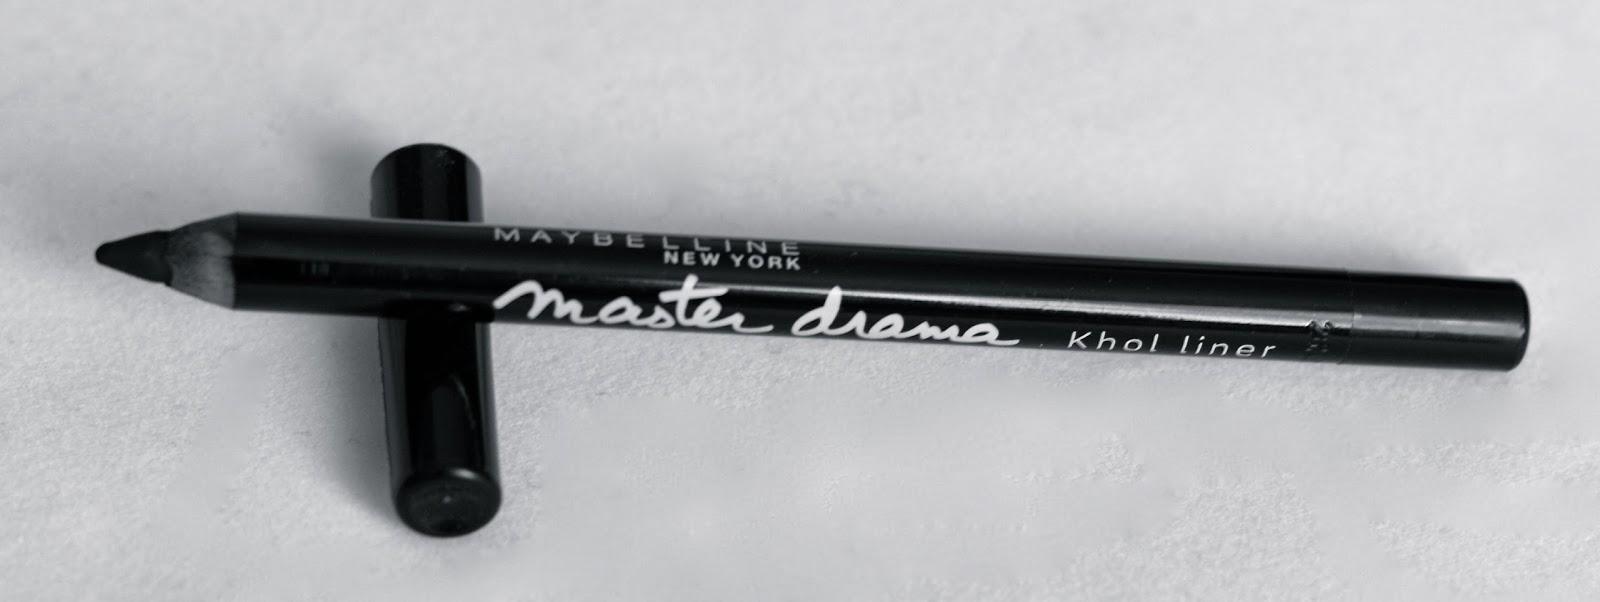 Imagini pentru Master Drama crayon khôl